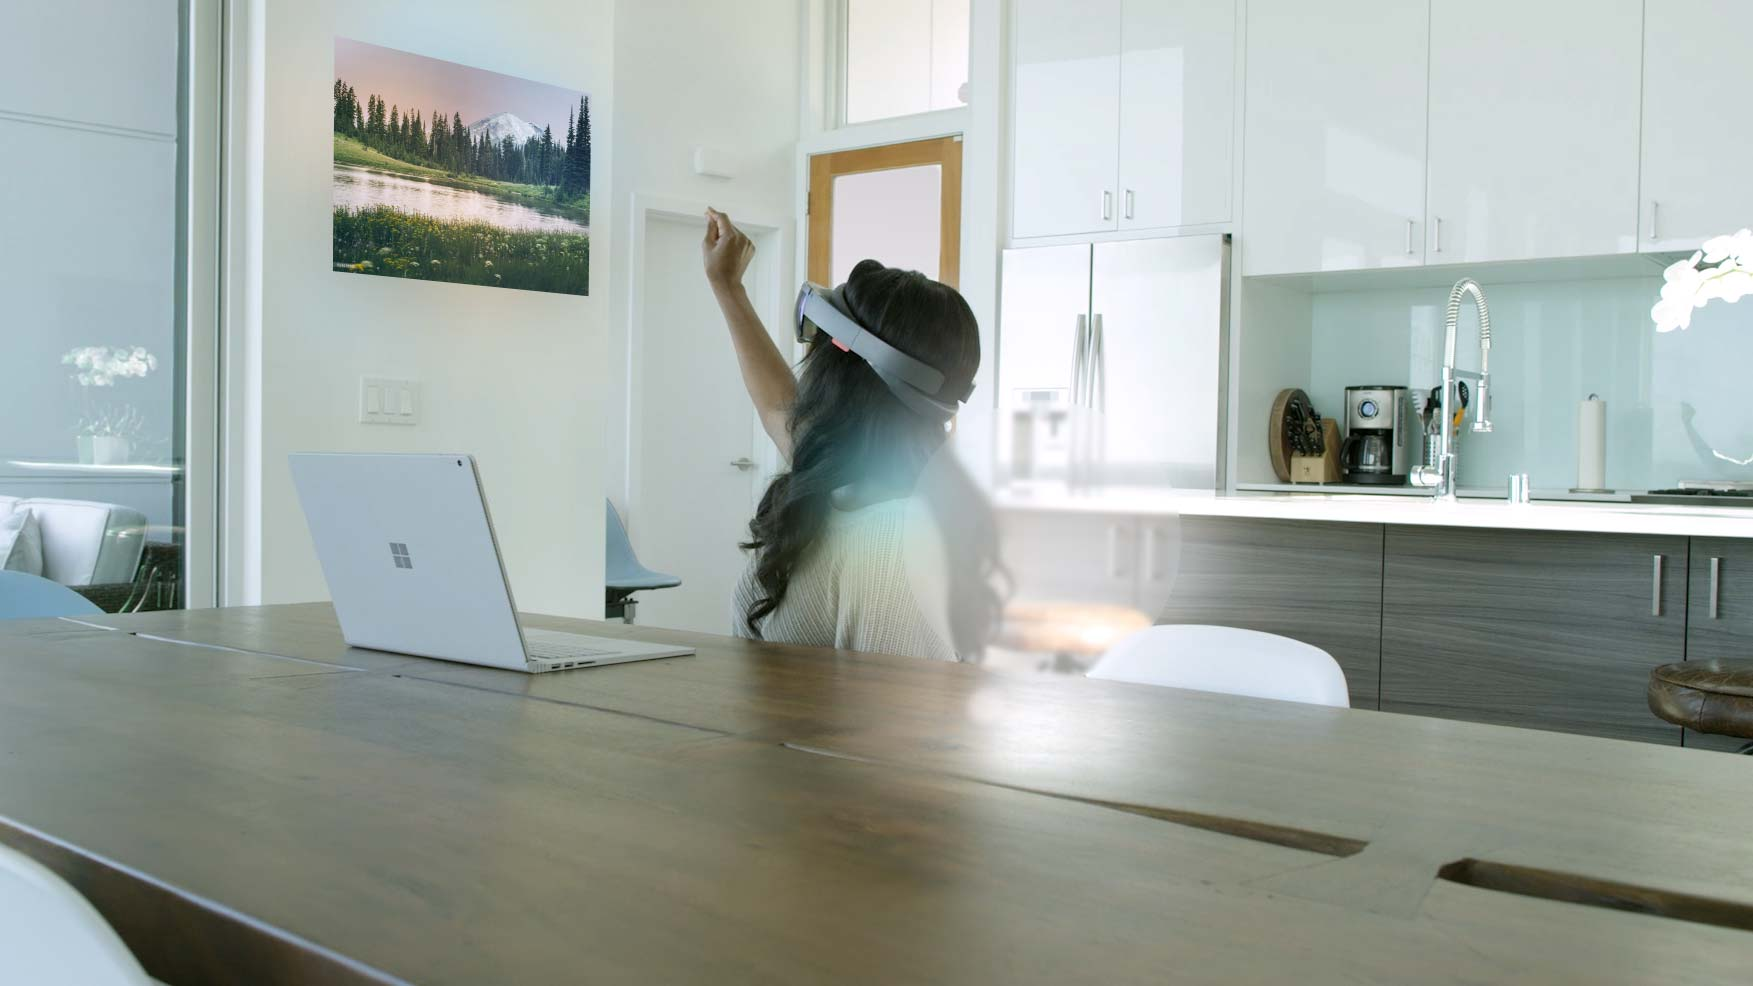 Microsoft Introducing Fluent Design System